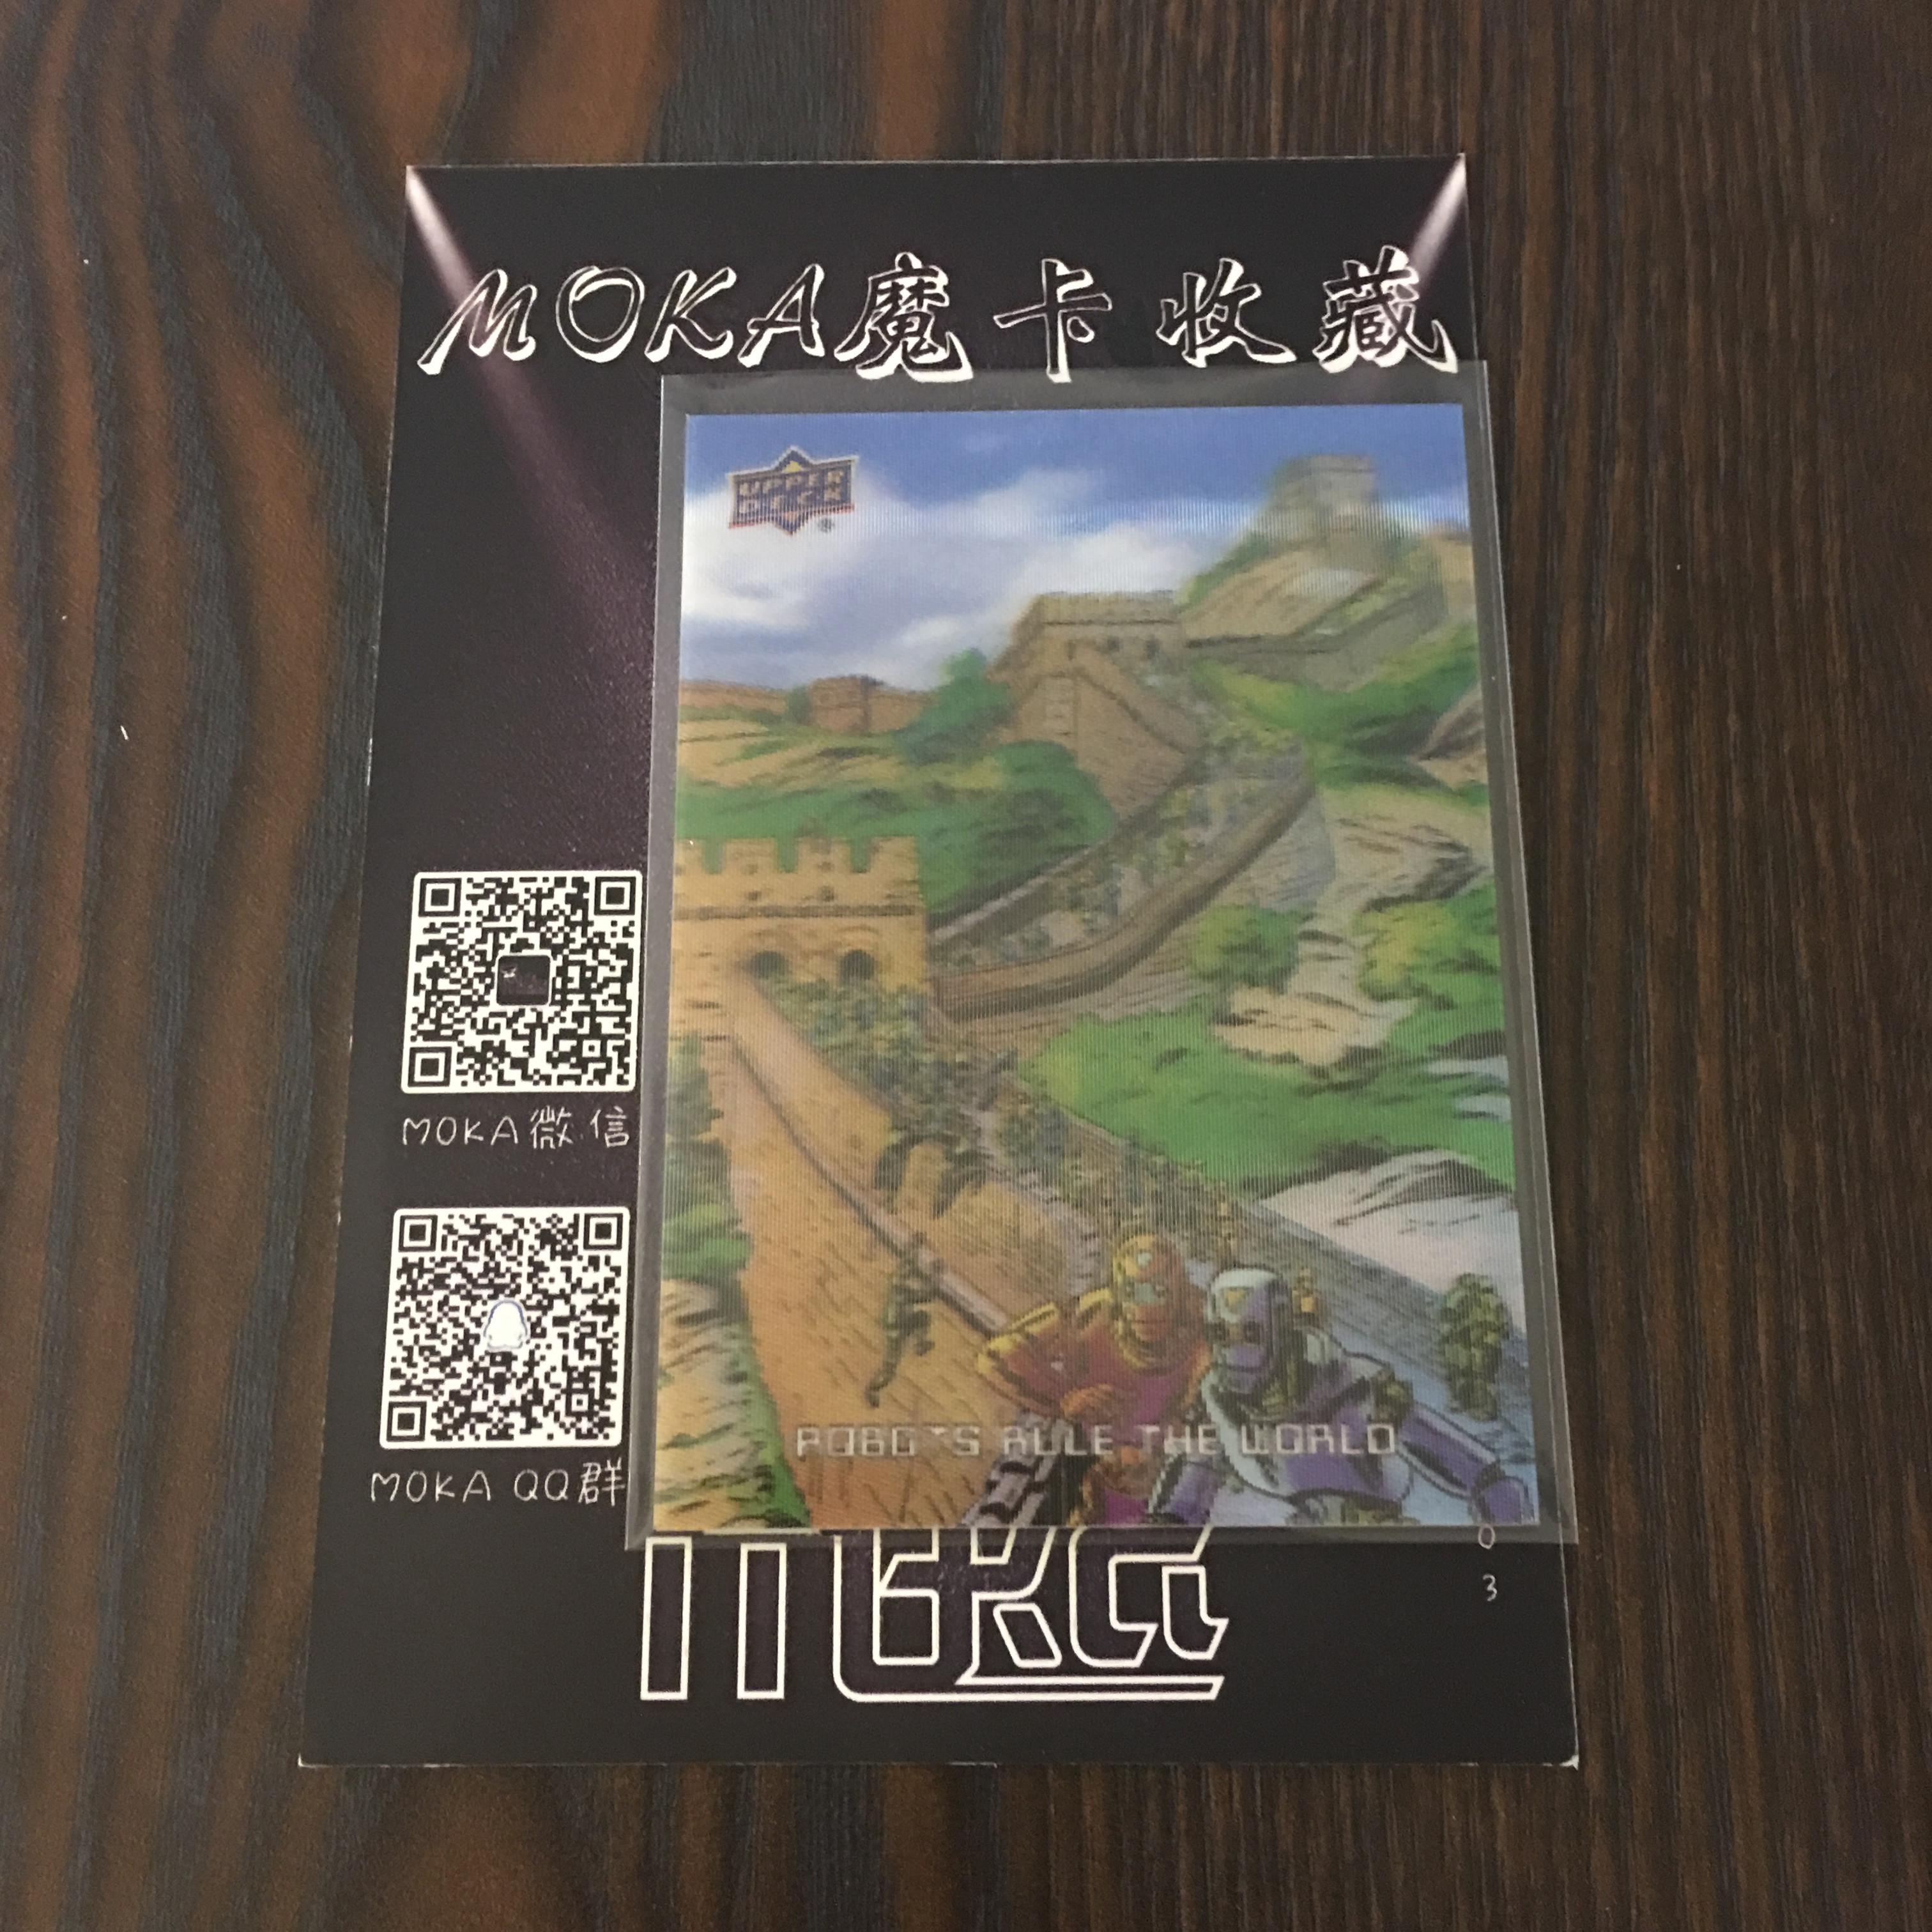 【MOKA球星卡收藏】#1804453 2018 UD Goodwin 古德温 3D特卡 编号 R-35 凑套必备